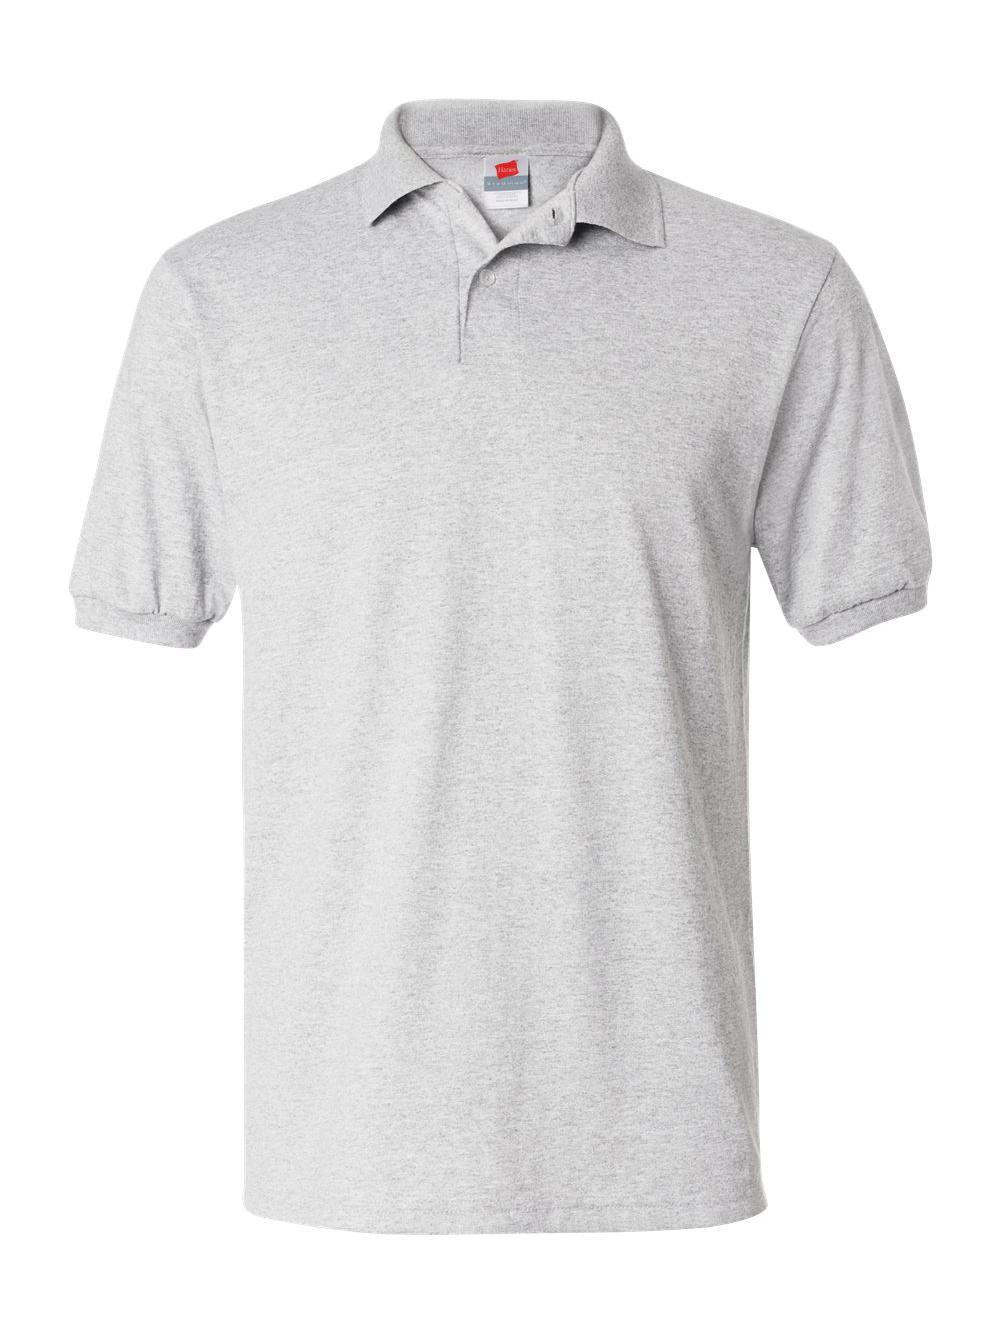 Hanes-Ecosmart-Jersey-Sport-Shirt-054X thumbnail 3